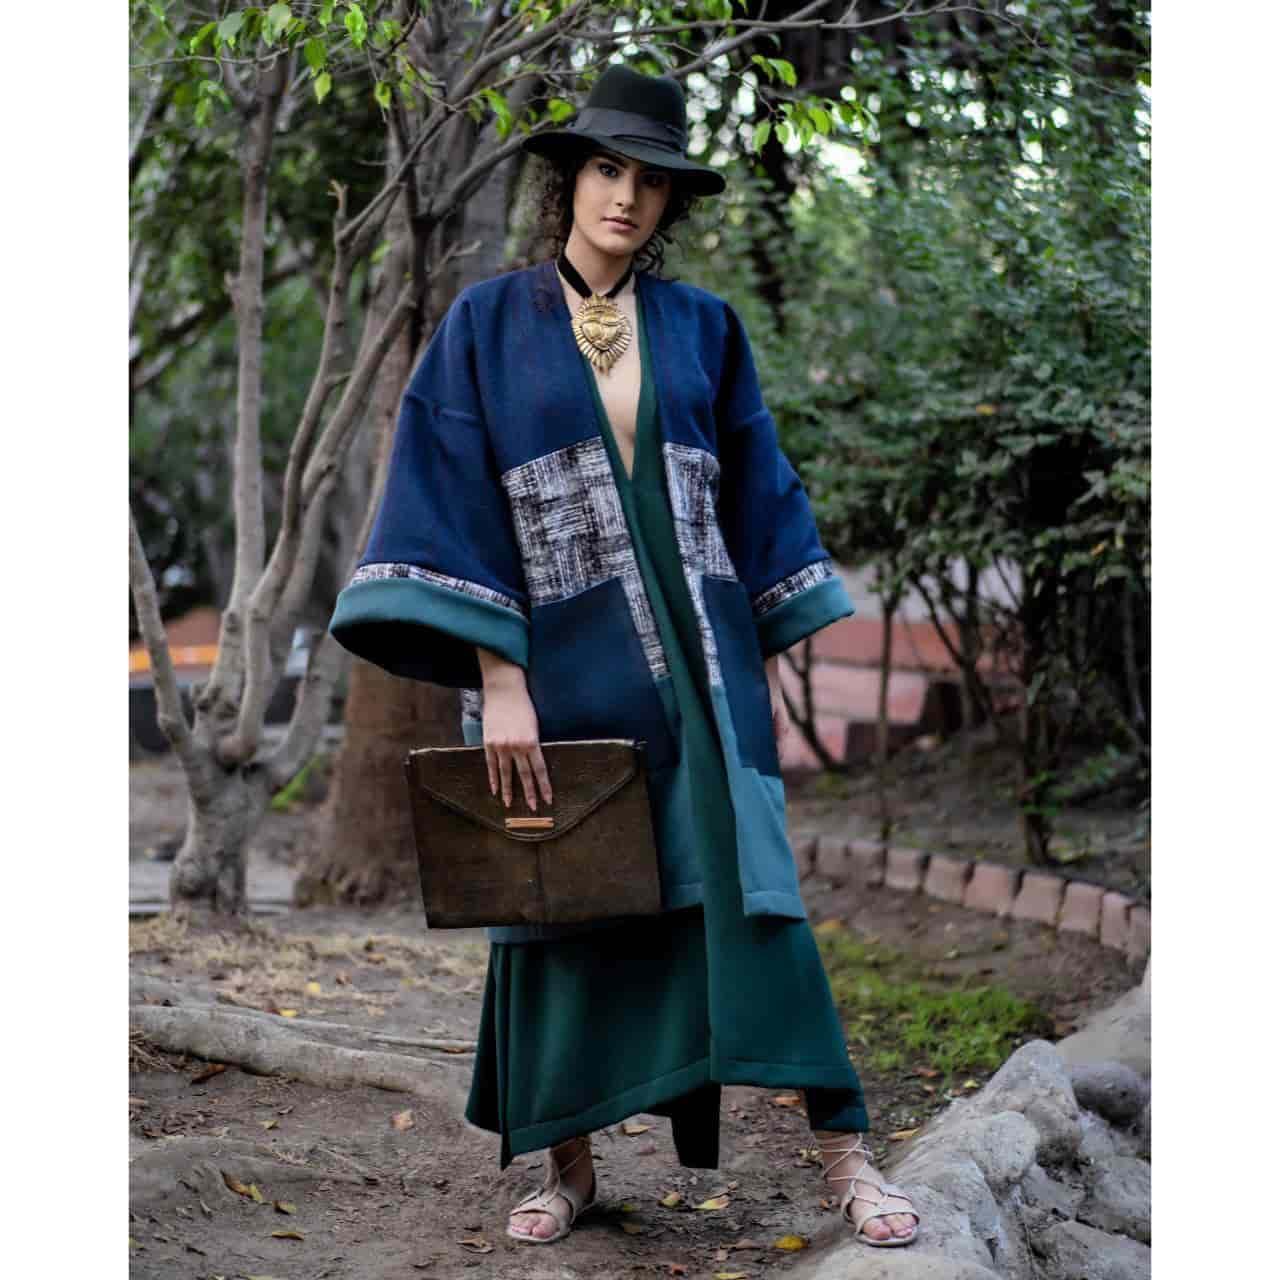 Tijuana a la Vanguardia en moda